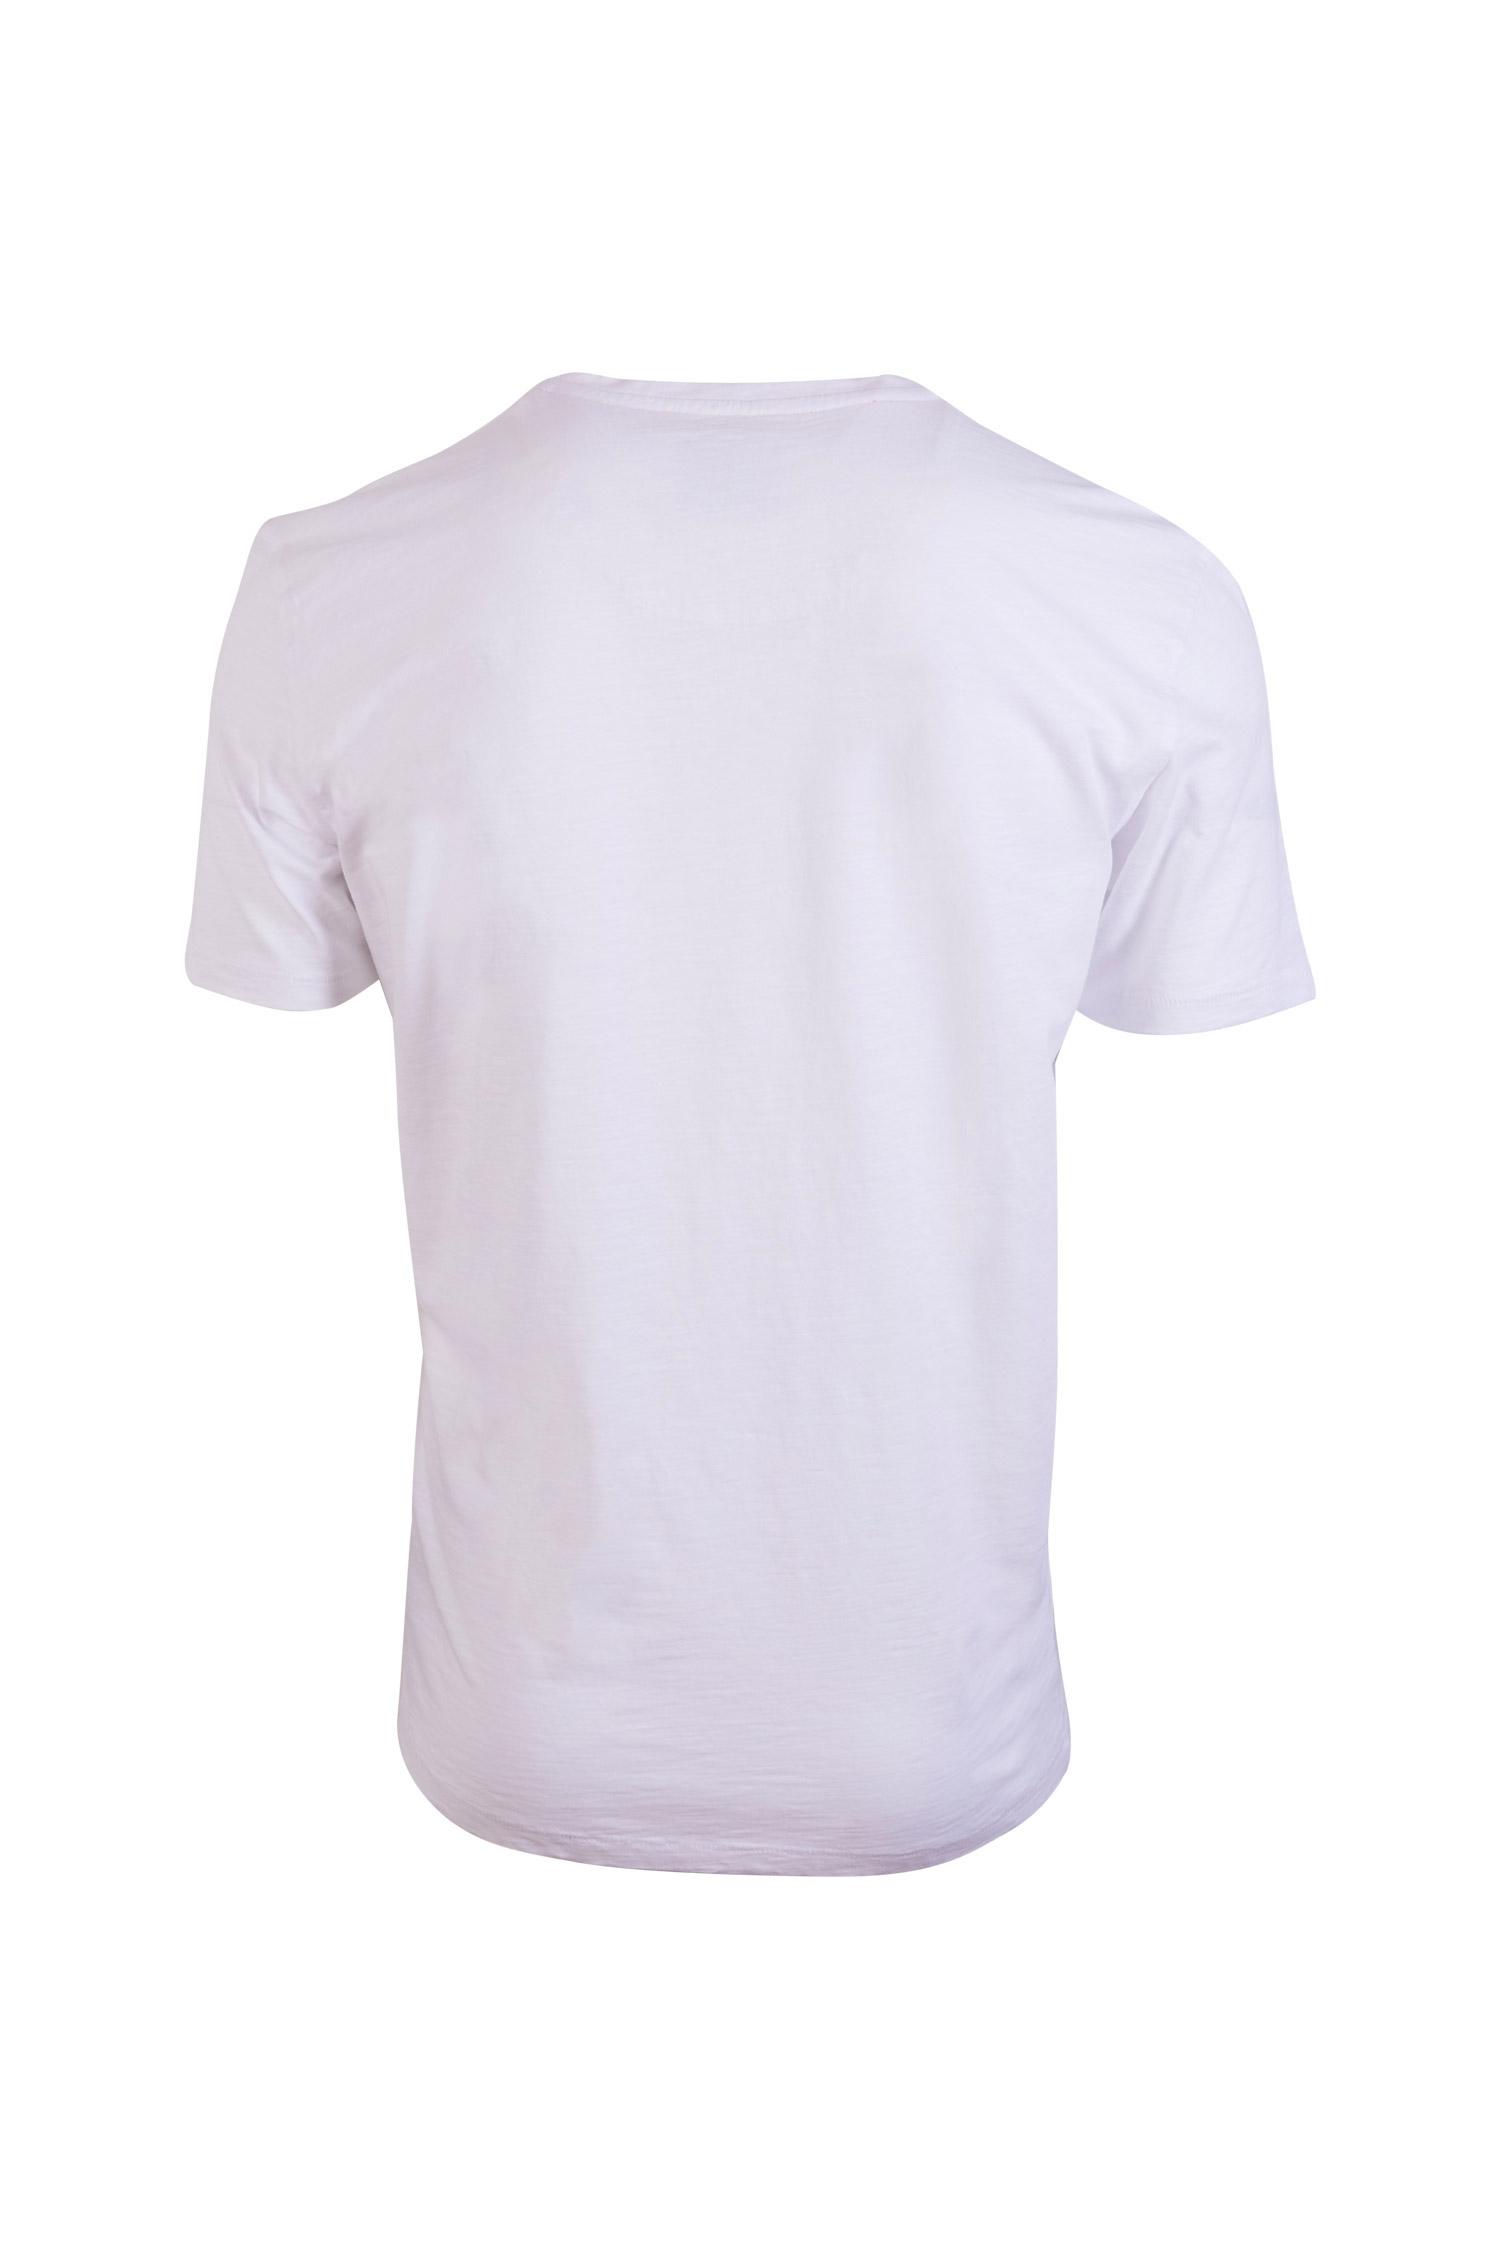 Sport, Camisetas M. Corta, 109160, BLANCO | Zoom